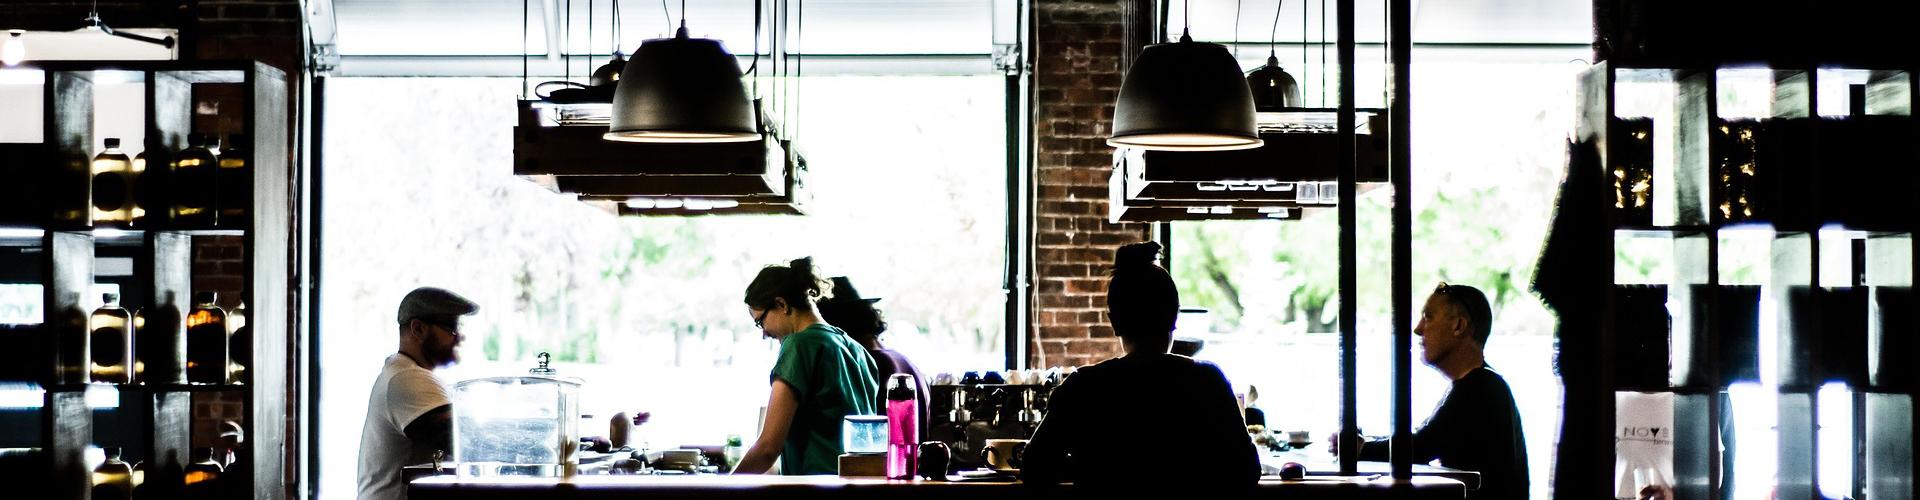 restaurants and cafe digital marketing